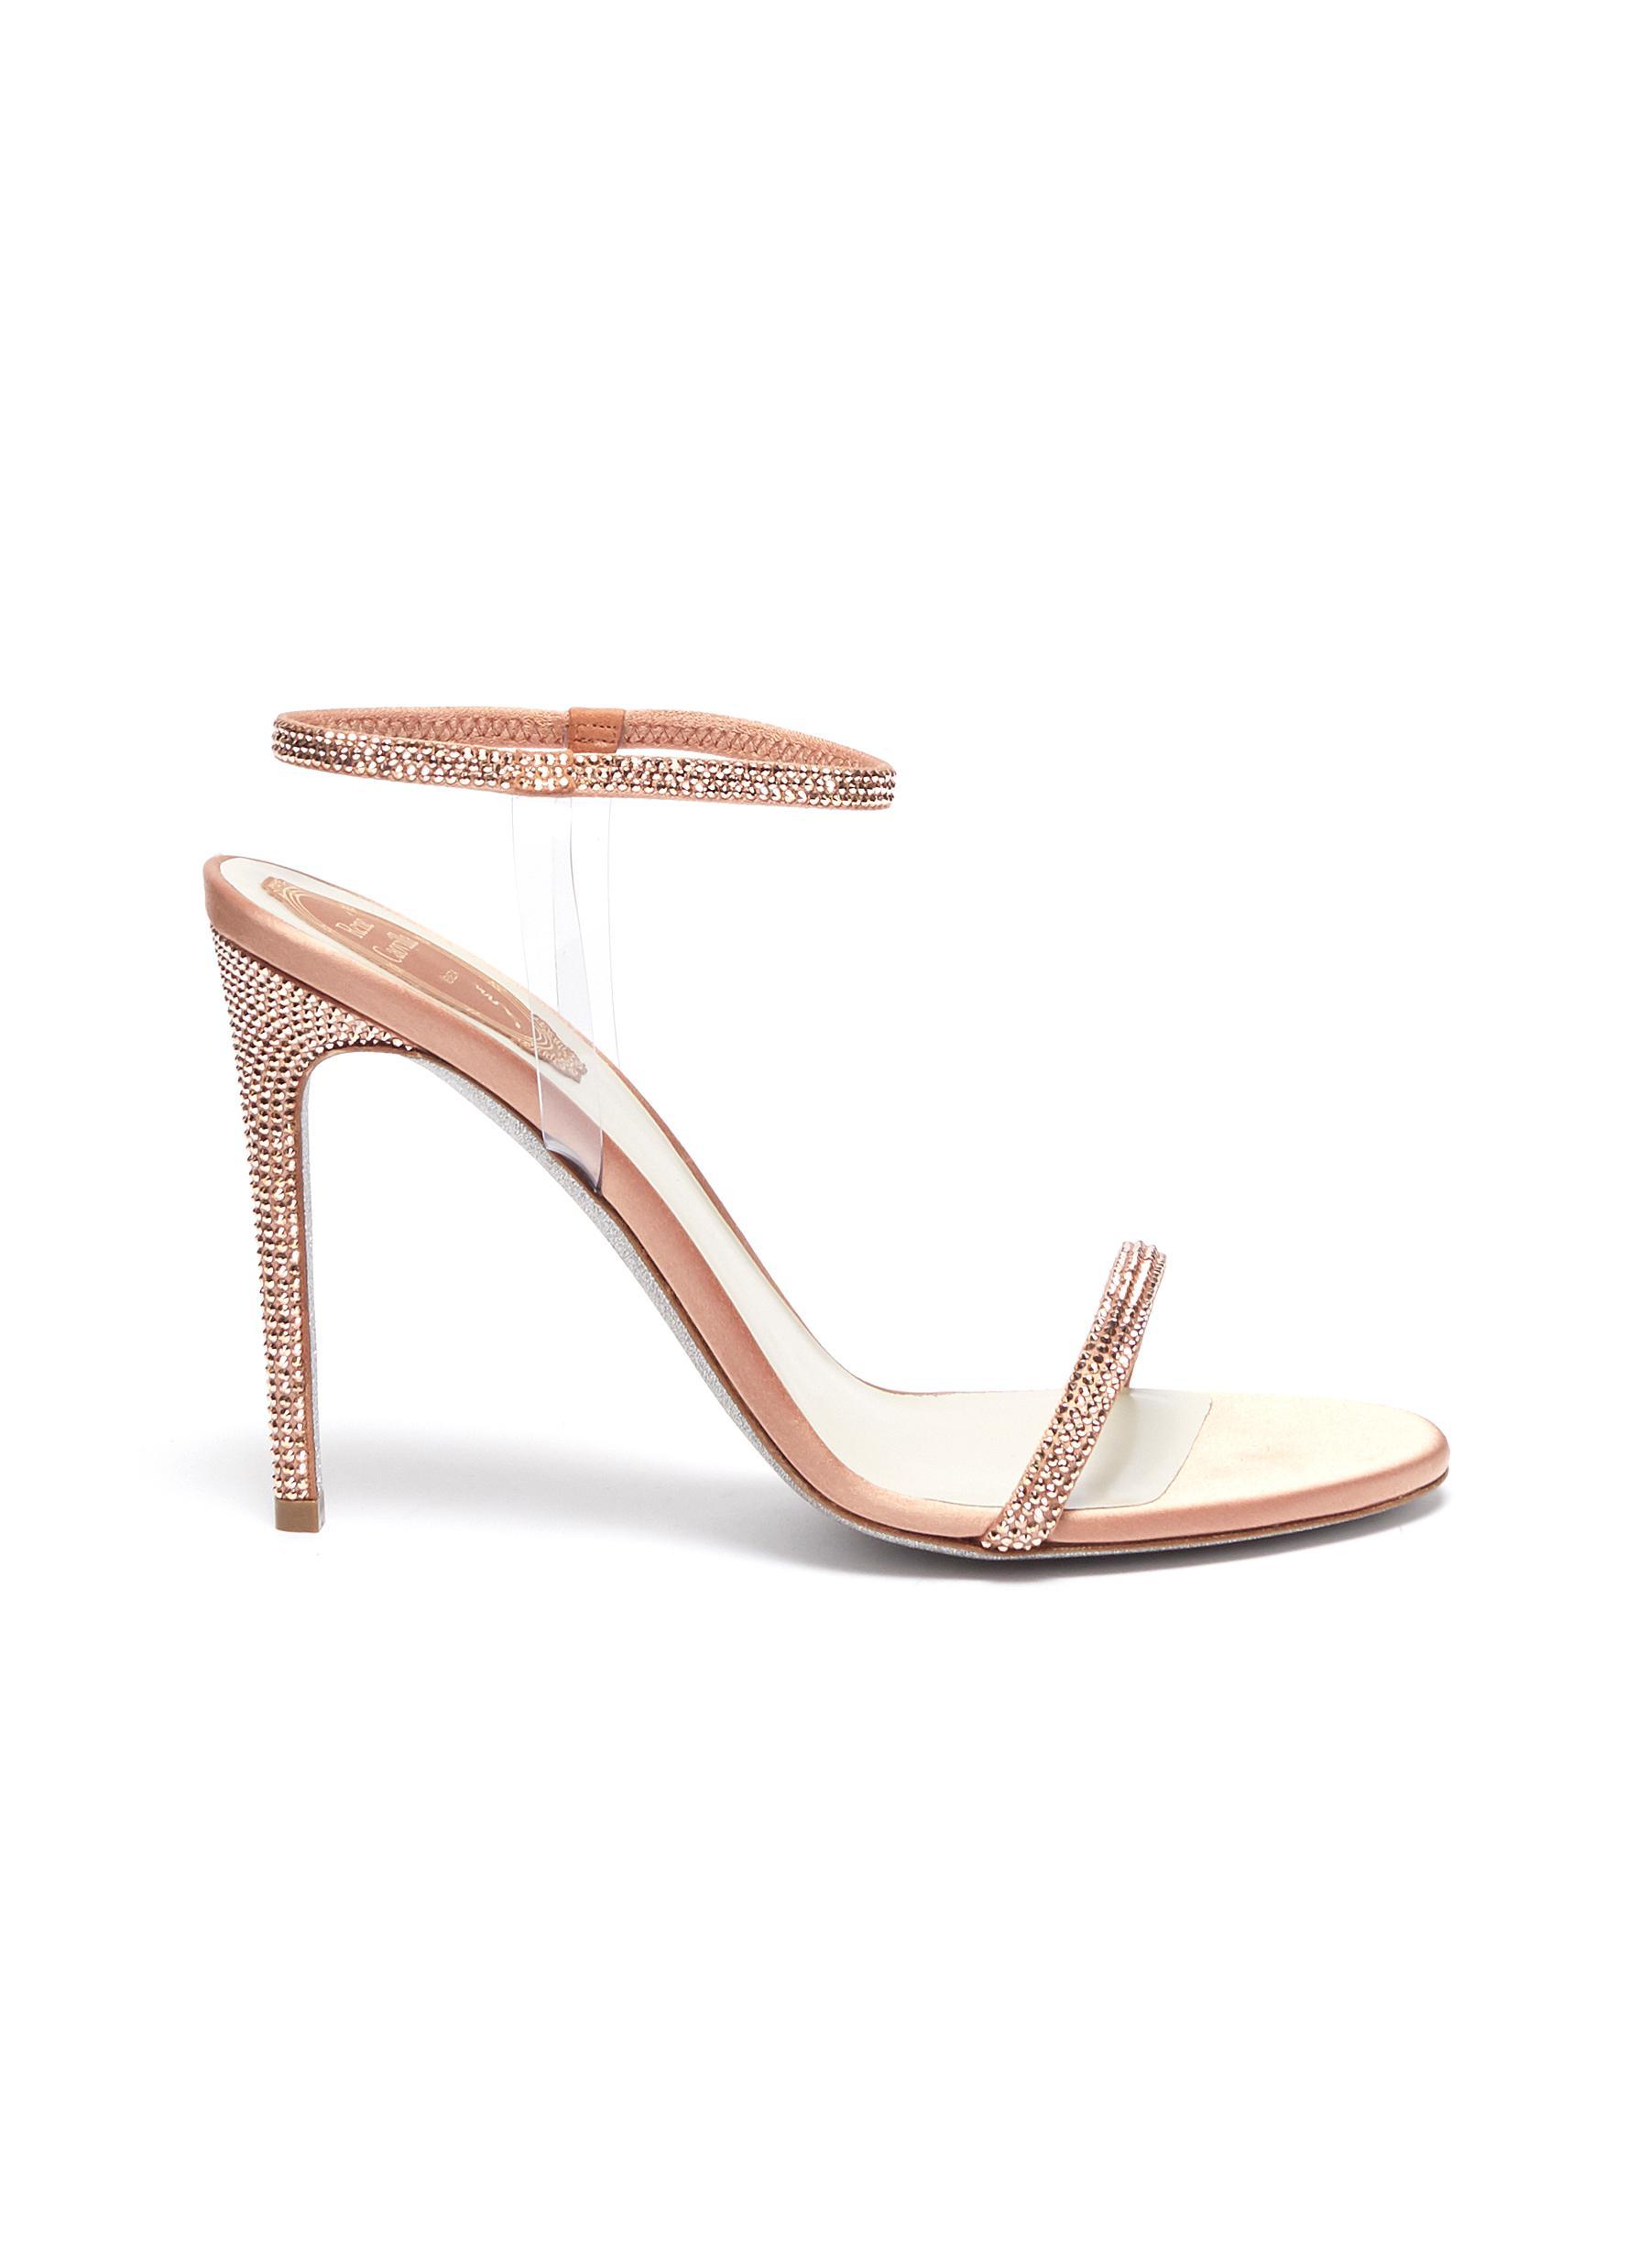 Elastica 105 ankle strap PVC strass satin sandals by René Caovilla